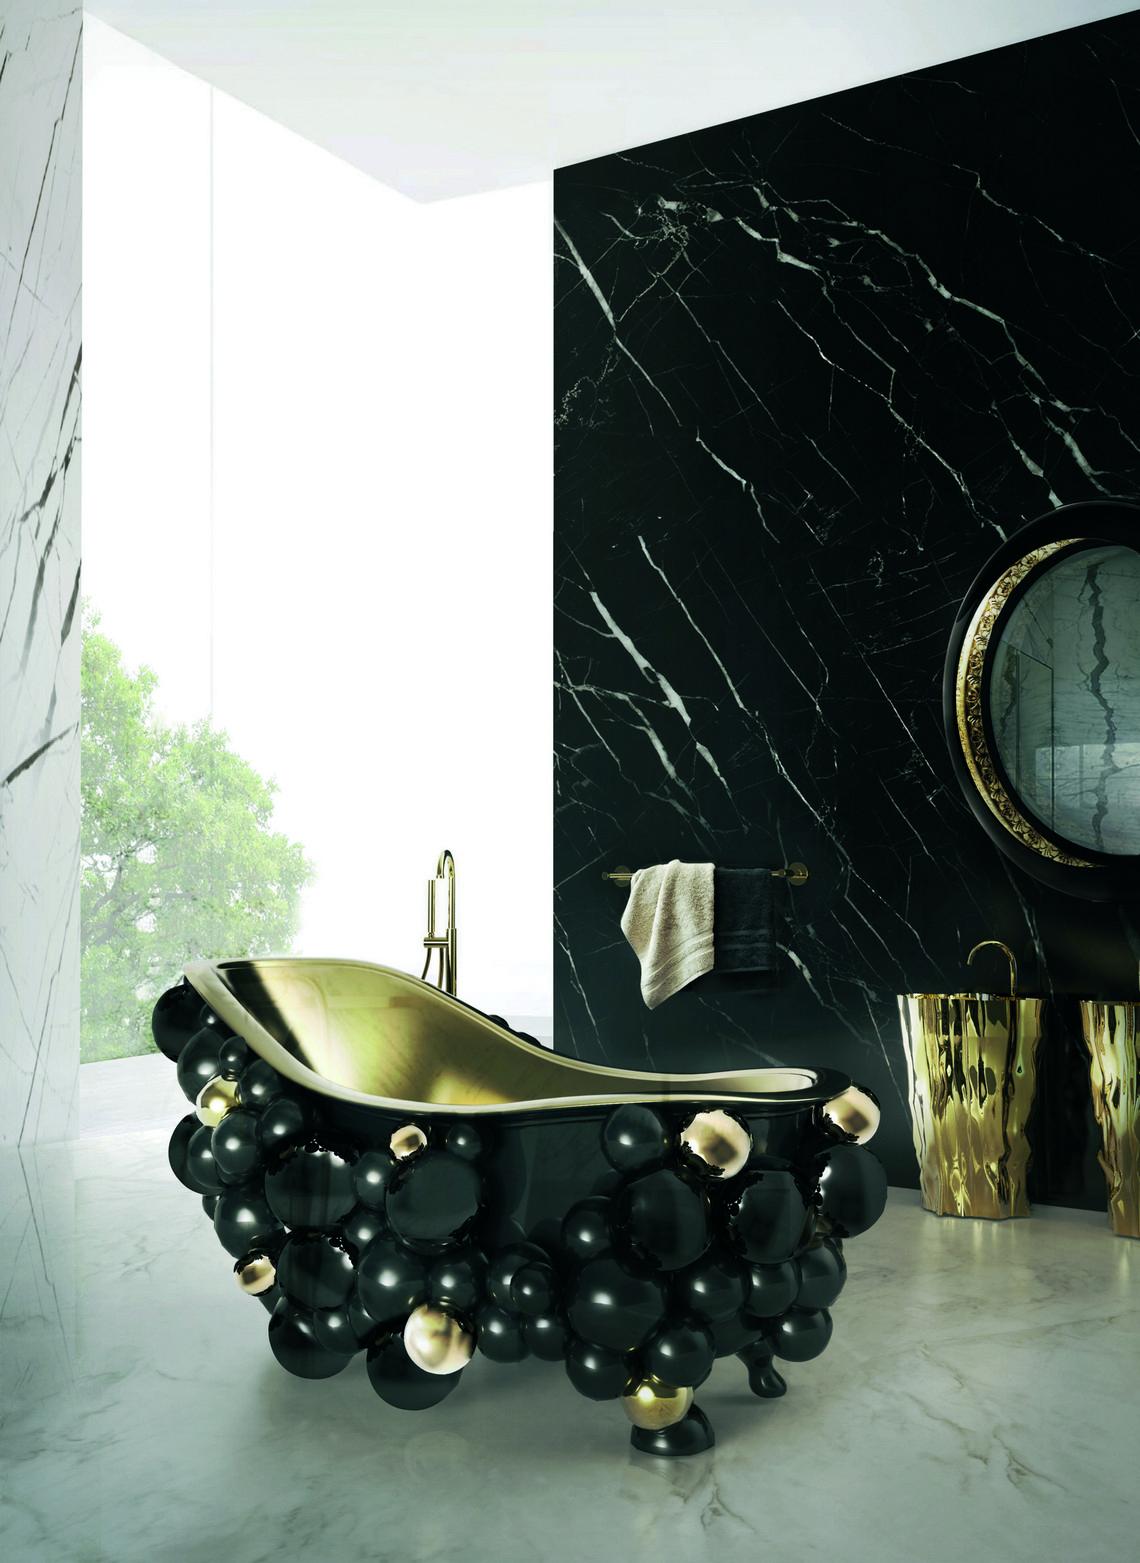 Top 5 Modern Bathtubs by Maison Valentina modern bathtubs Top 5 Modern Bathtubs by Maison Valentina img7 1